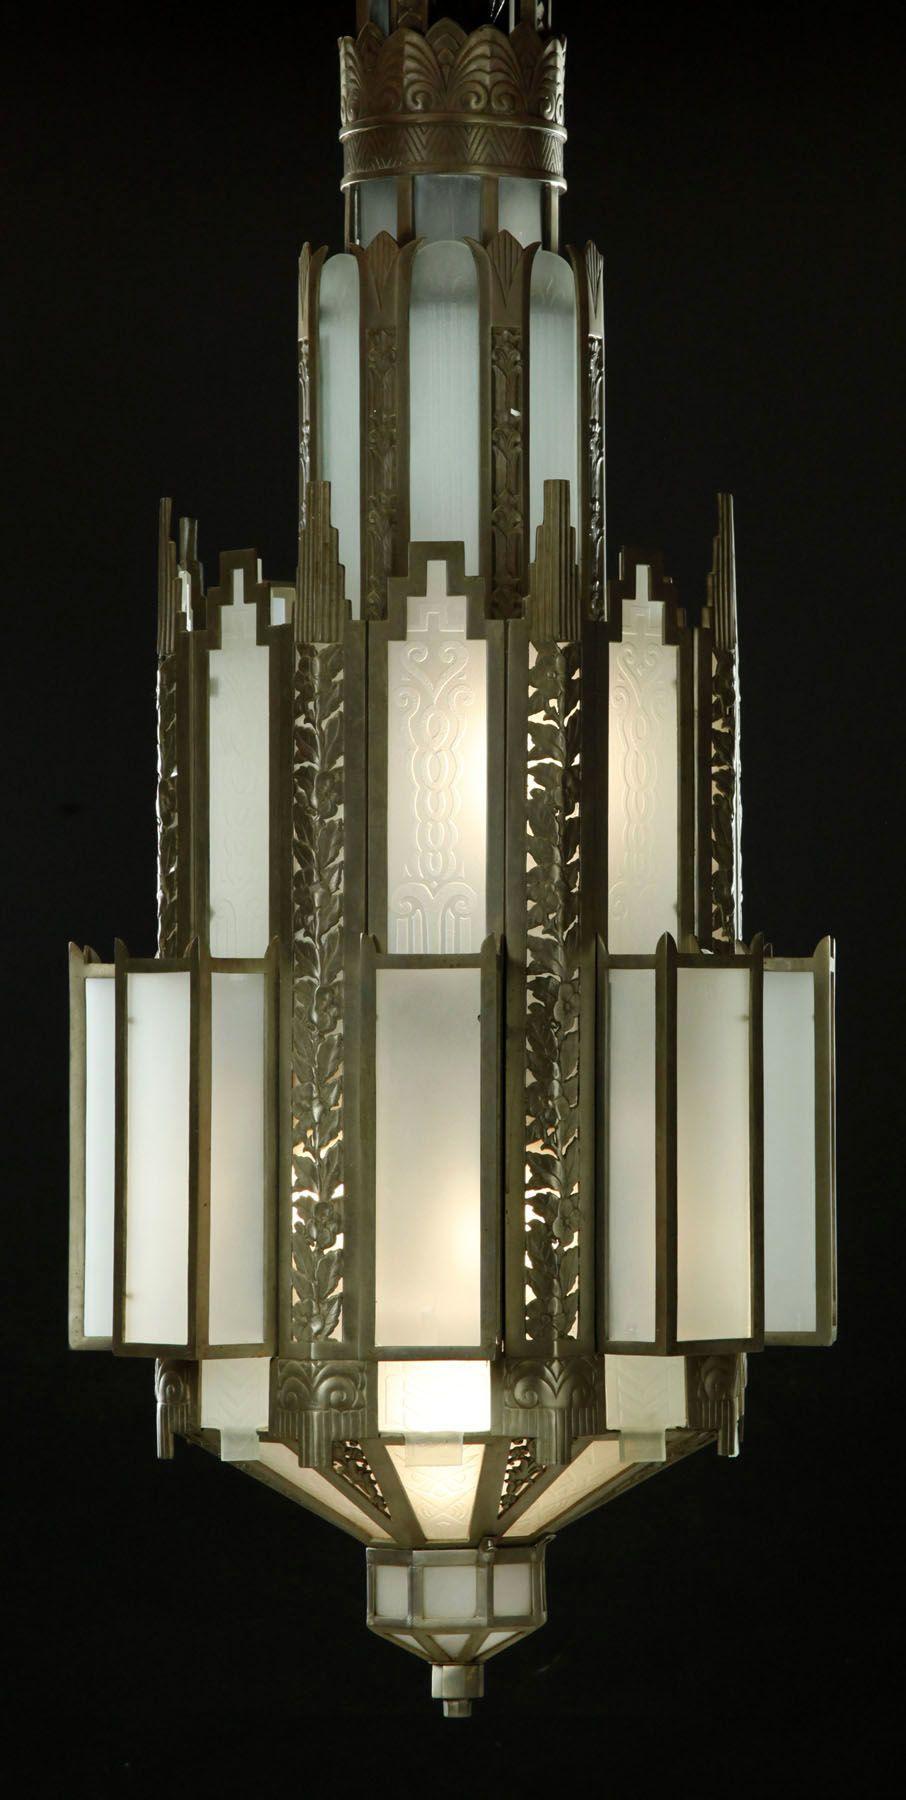 art d co luminaire lustre ann es 30 art deco art. Black Bedroom Furniture Sets. Home Design Ideas